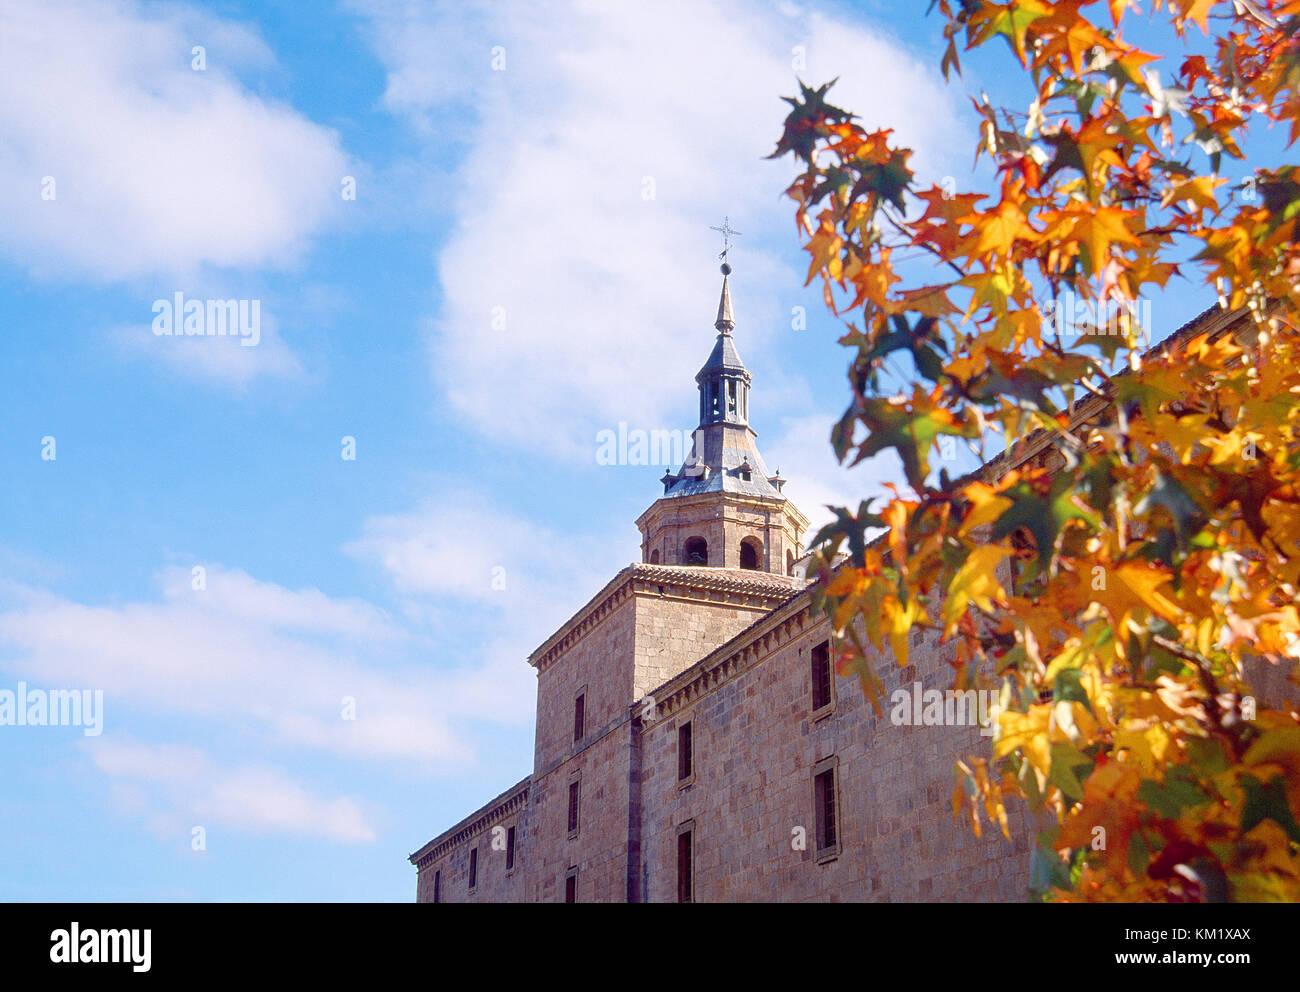 Facade of Yuso monastery. San Millan de la Cogolla, La Rioja, Spain. - Stock Image